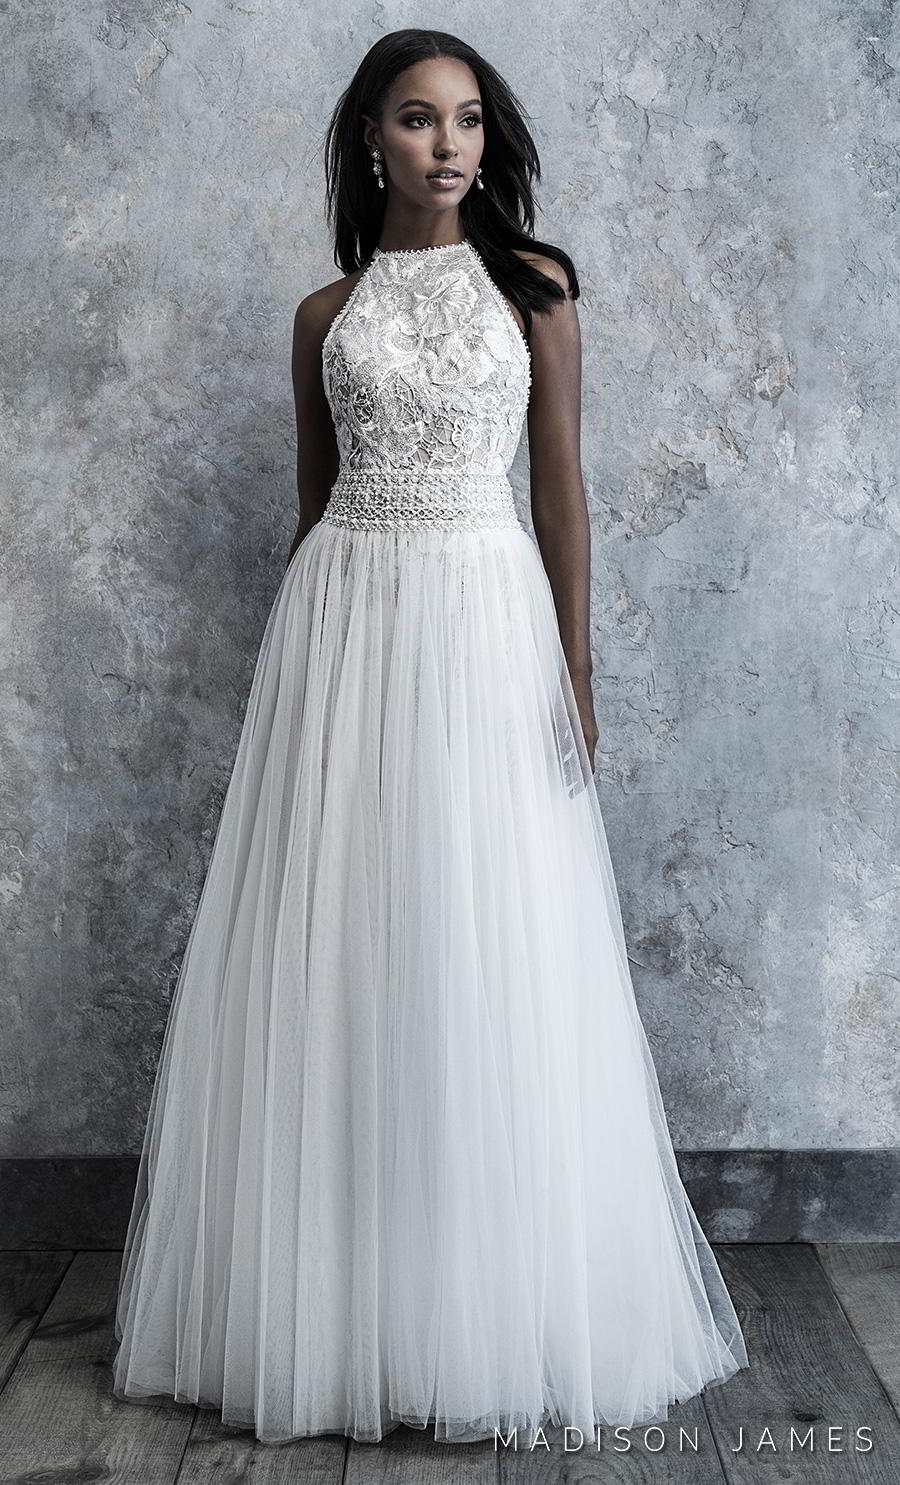 madison james 2019 bridal sleeveless halter neck heavily embellished bodice pleated skirt romantic soft a line wedding dress keyhole back chapel train (500) mv